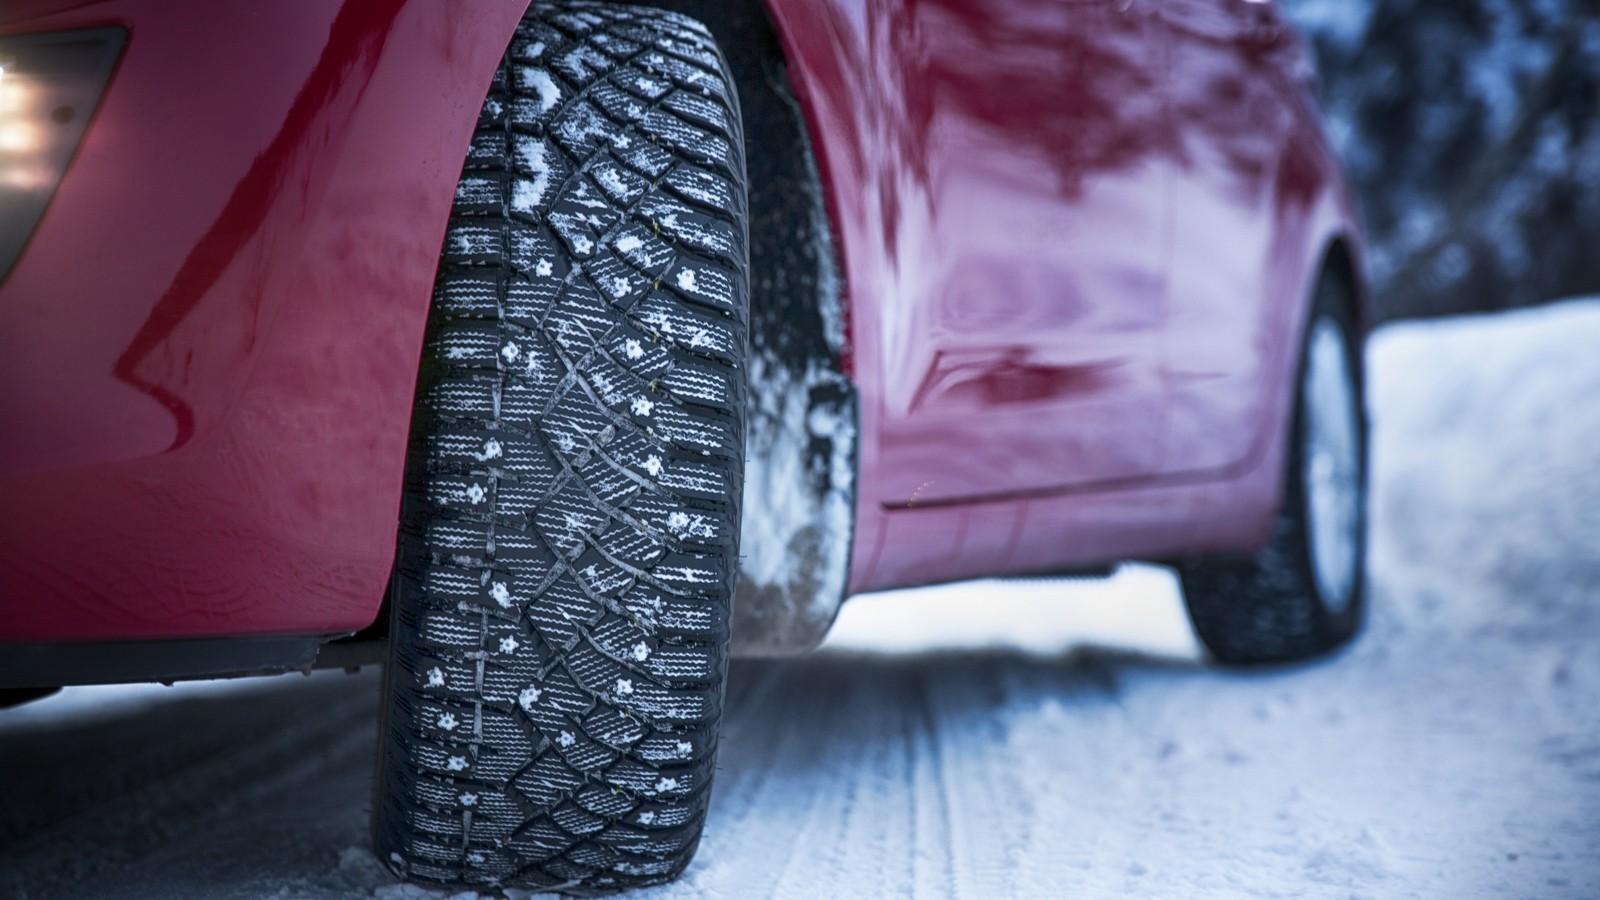 Зимняя резина на автомобиле